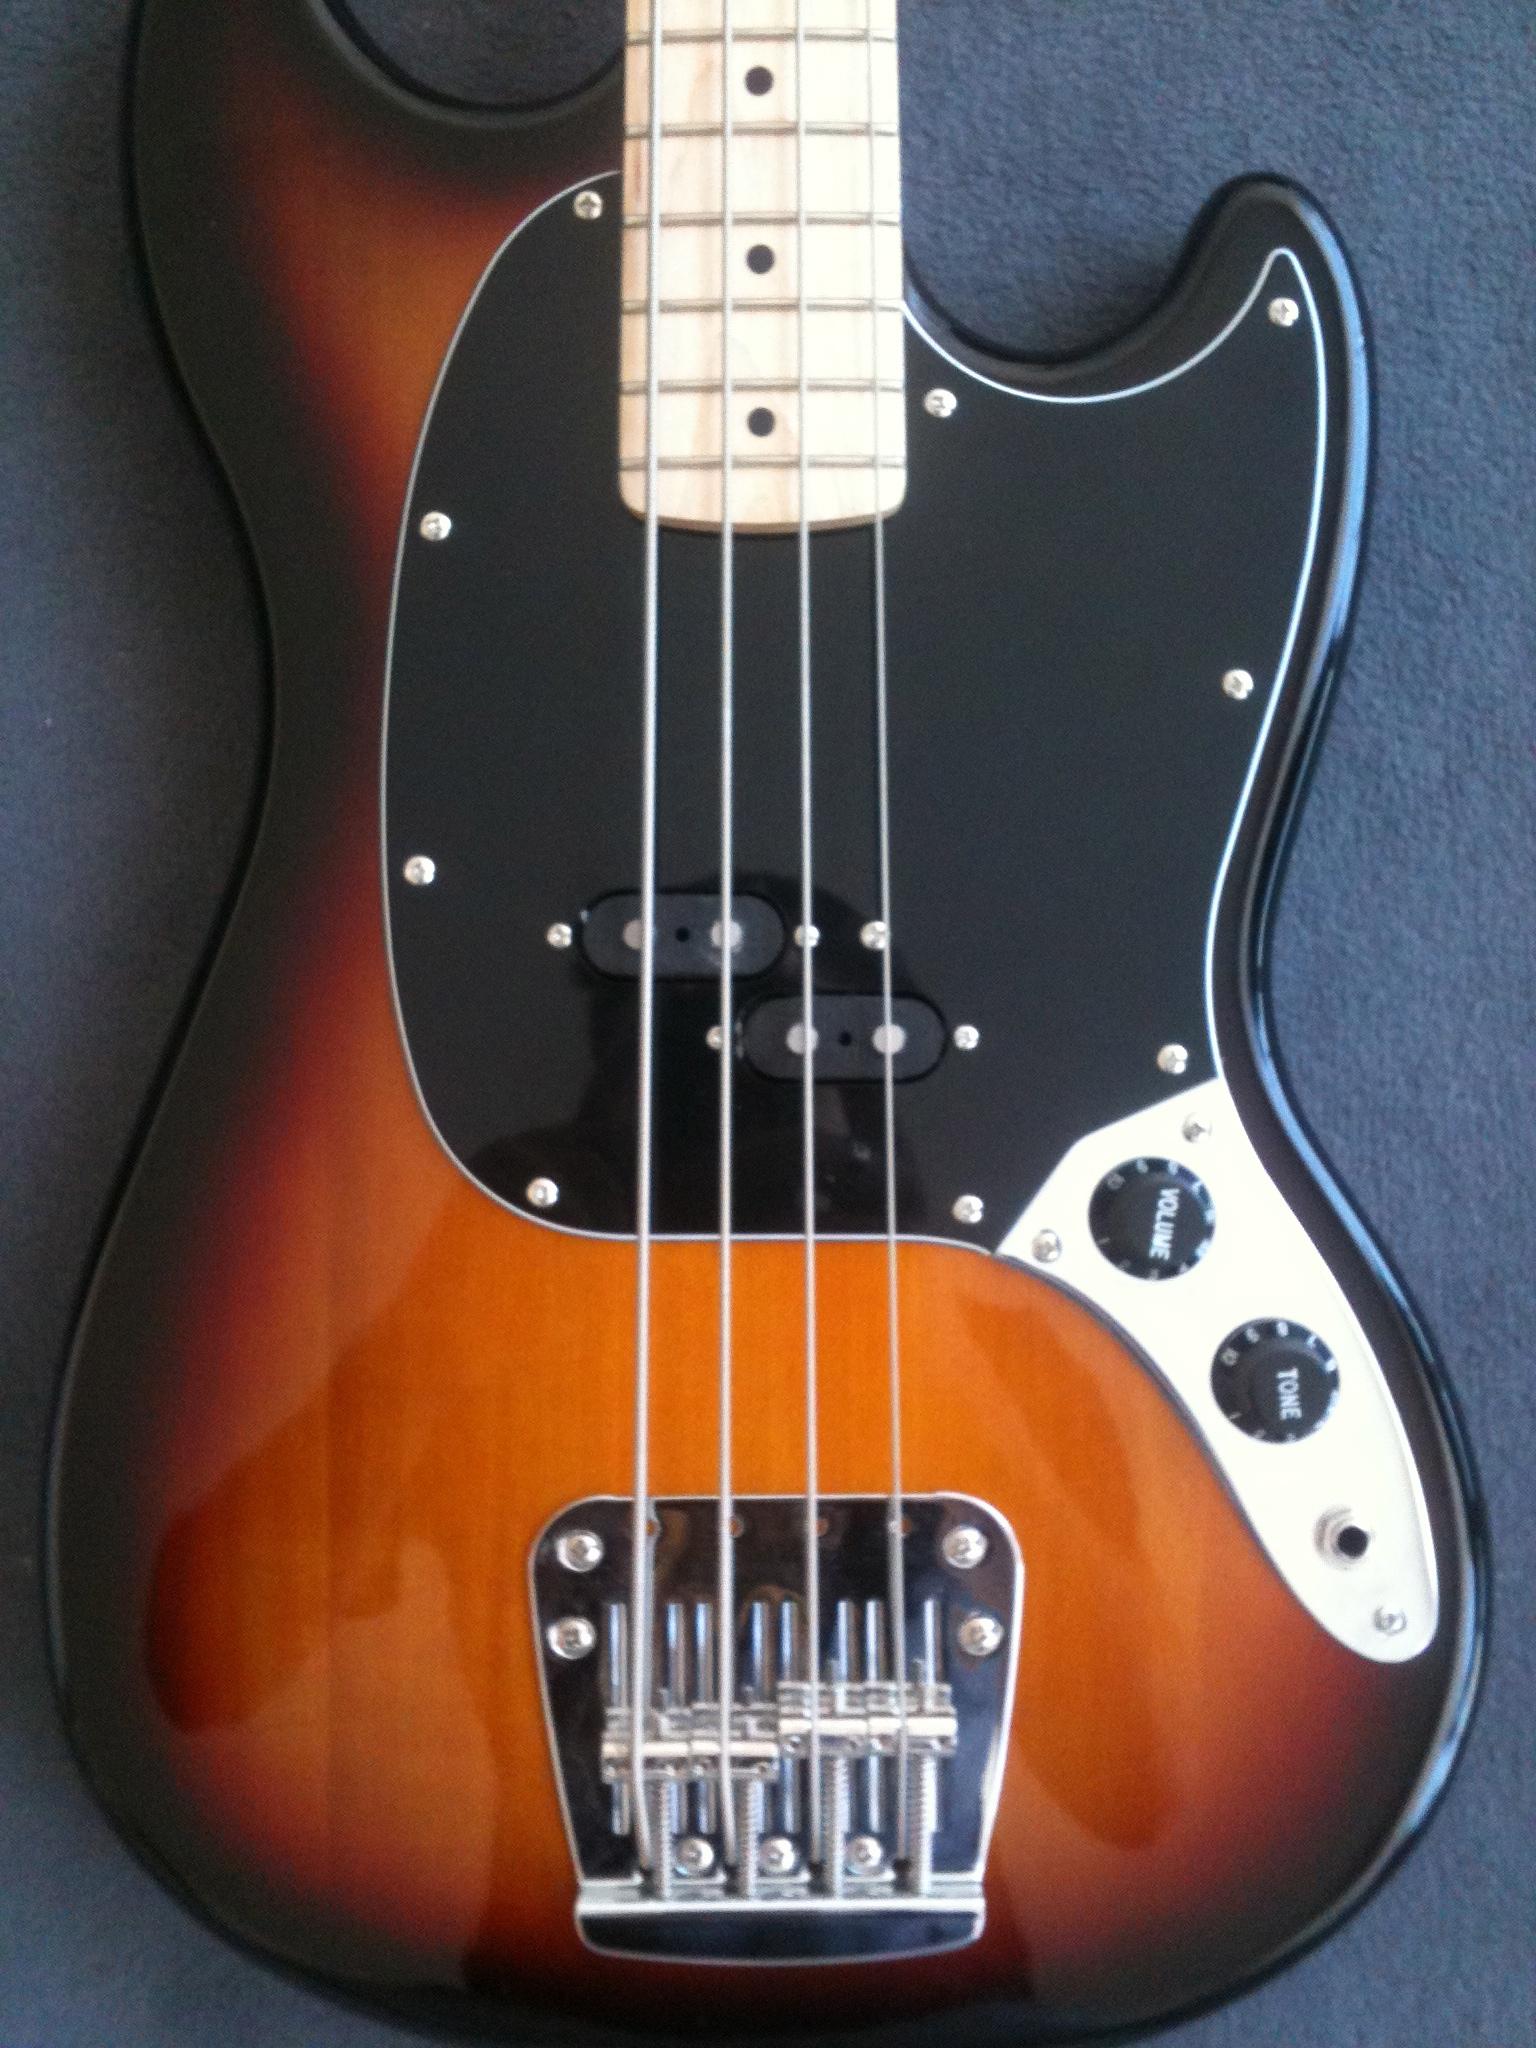 squier vintage modified mustang bass image 797592 audiofanzine. Black Bedroom Furniture Sets. Home Design Ideas